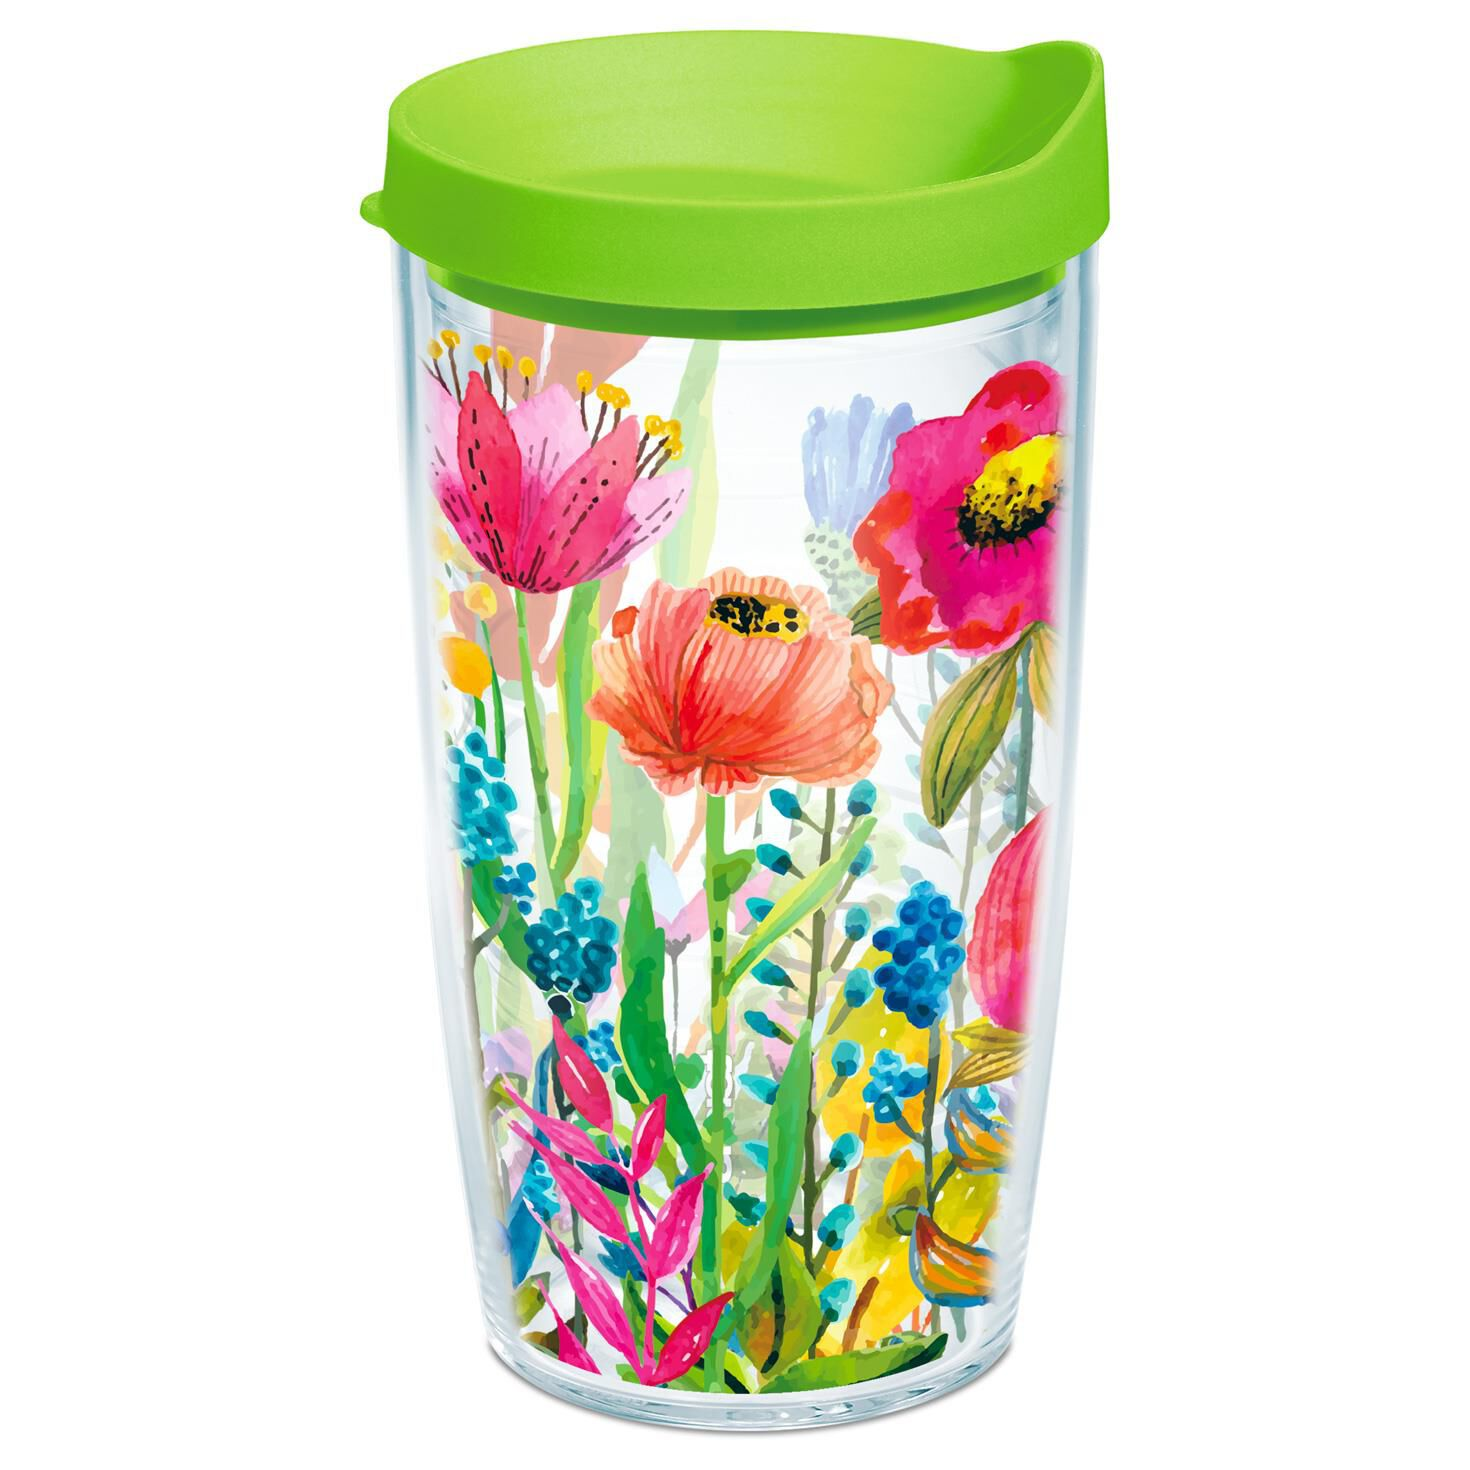 tervis watercolor wildflowers tumbler 16 oz - Tervis Tumblers